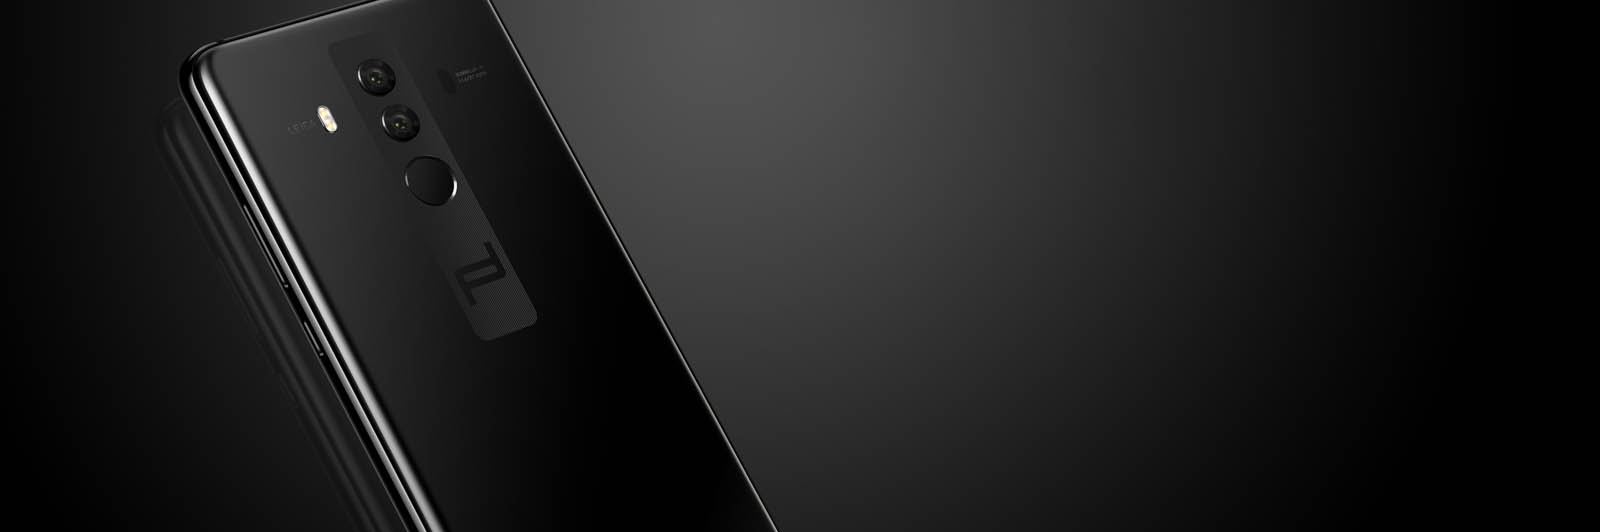 Huawei_Mate_10_Porsche_Design_07